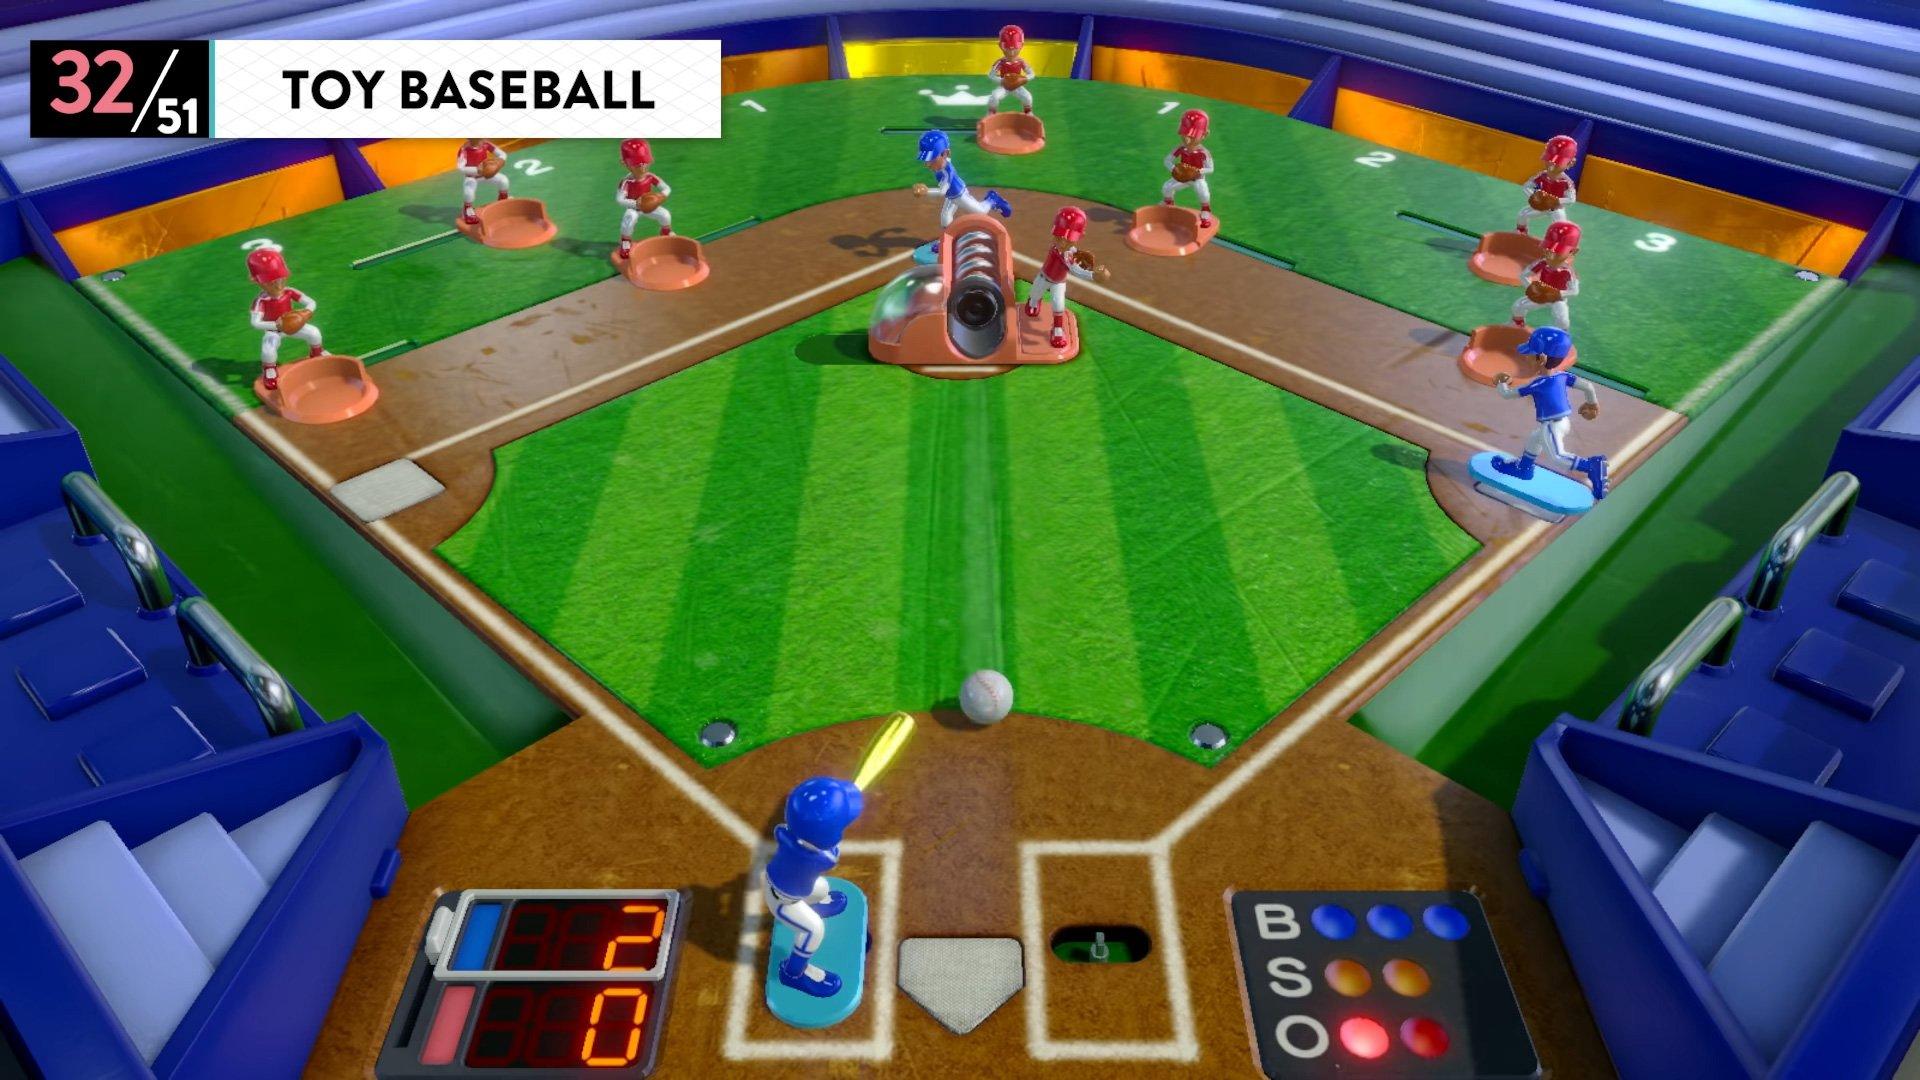 Toy Baseball